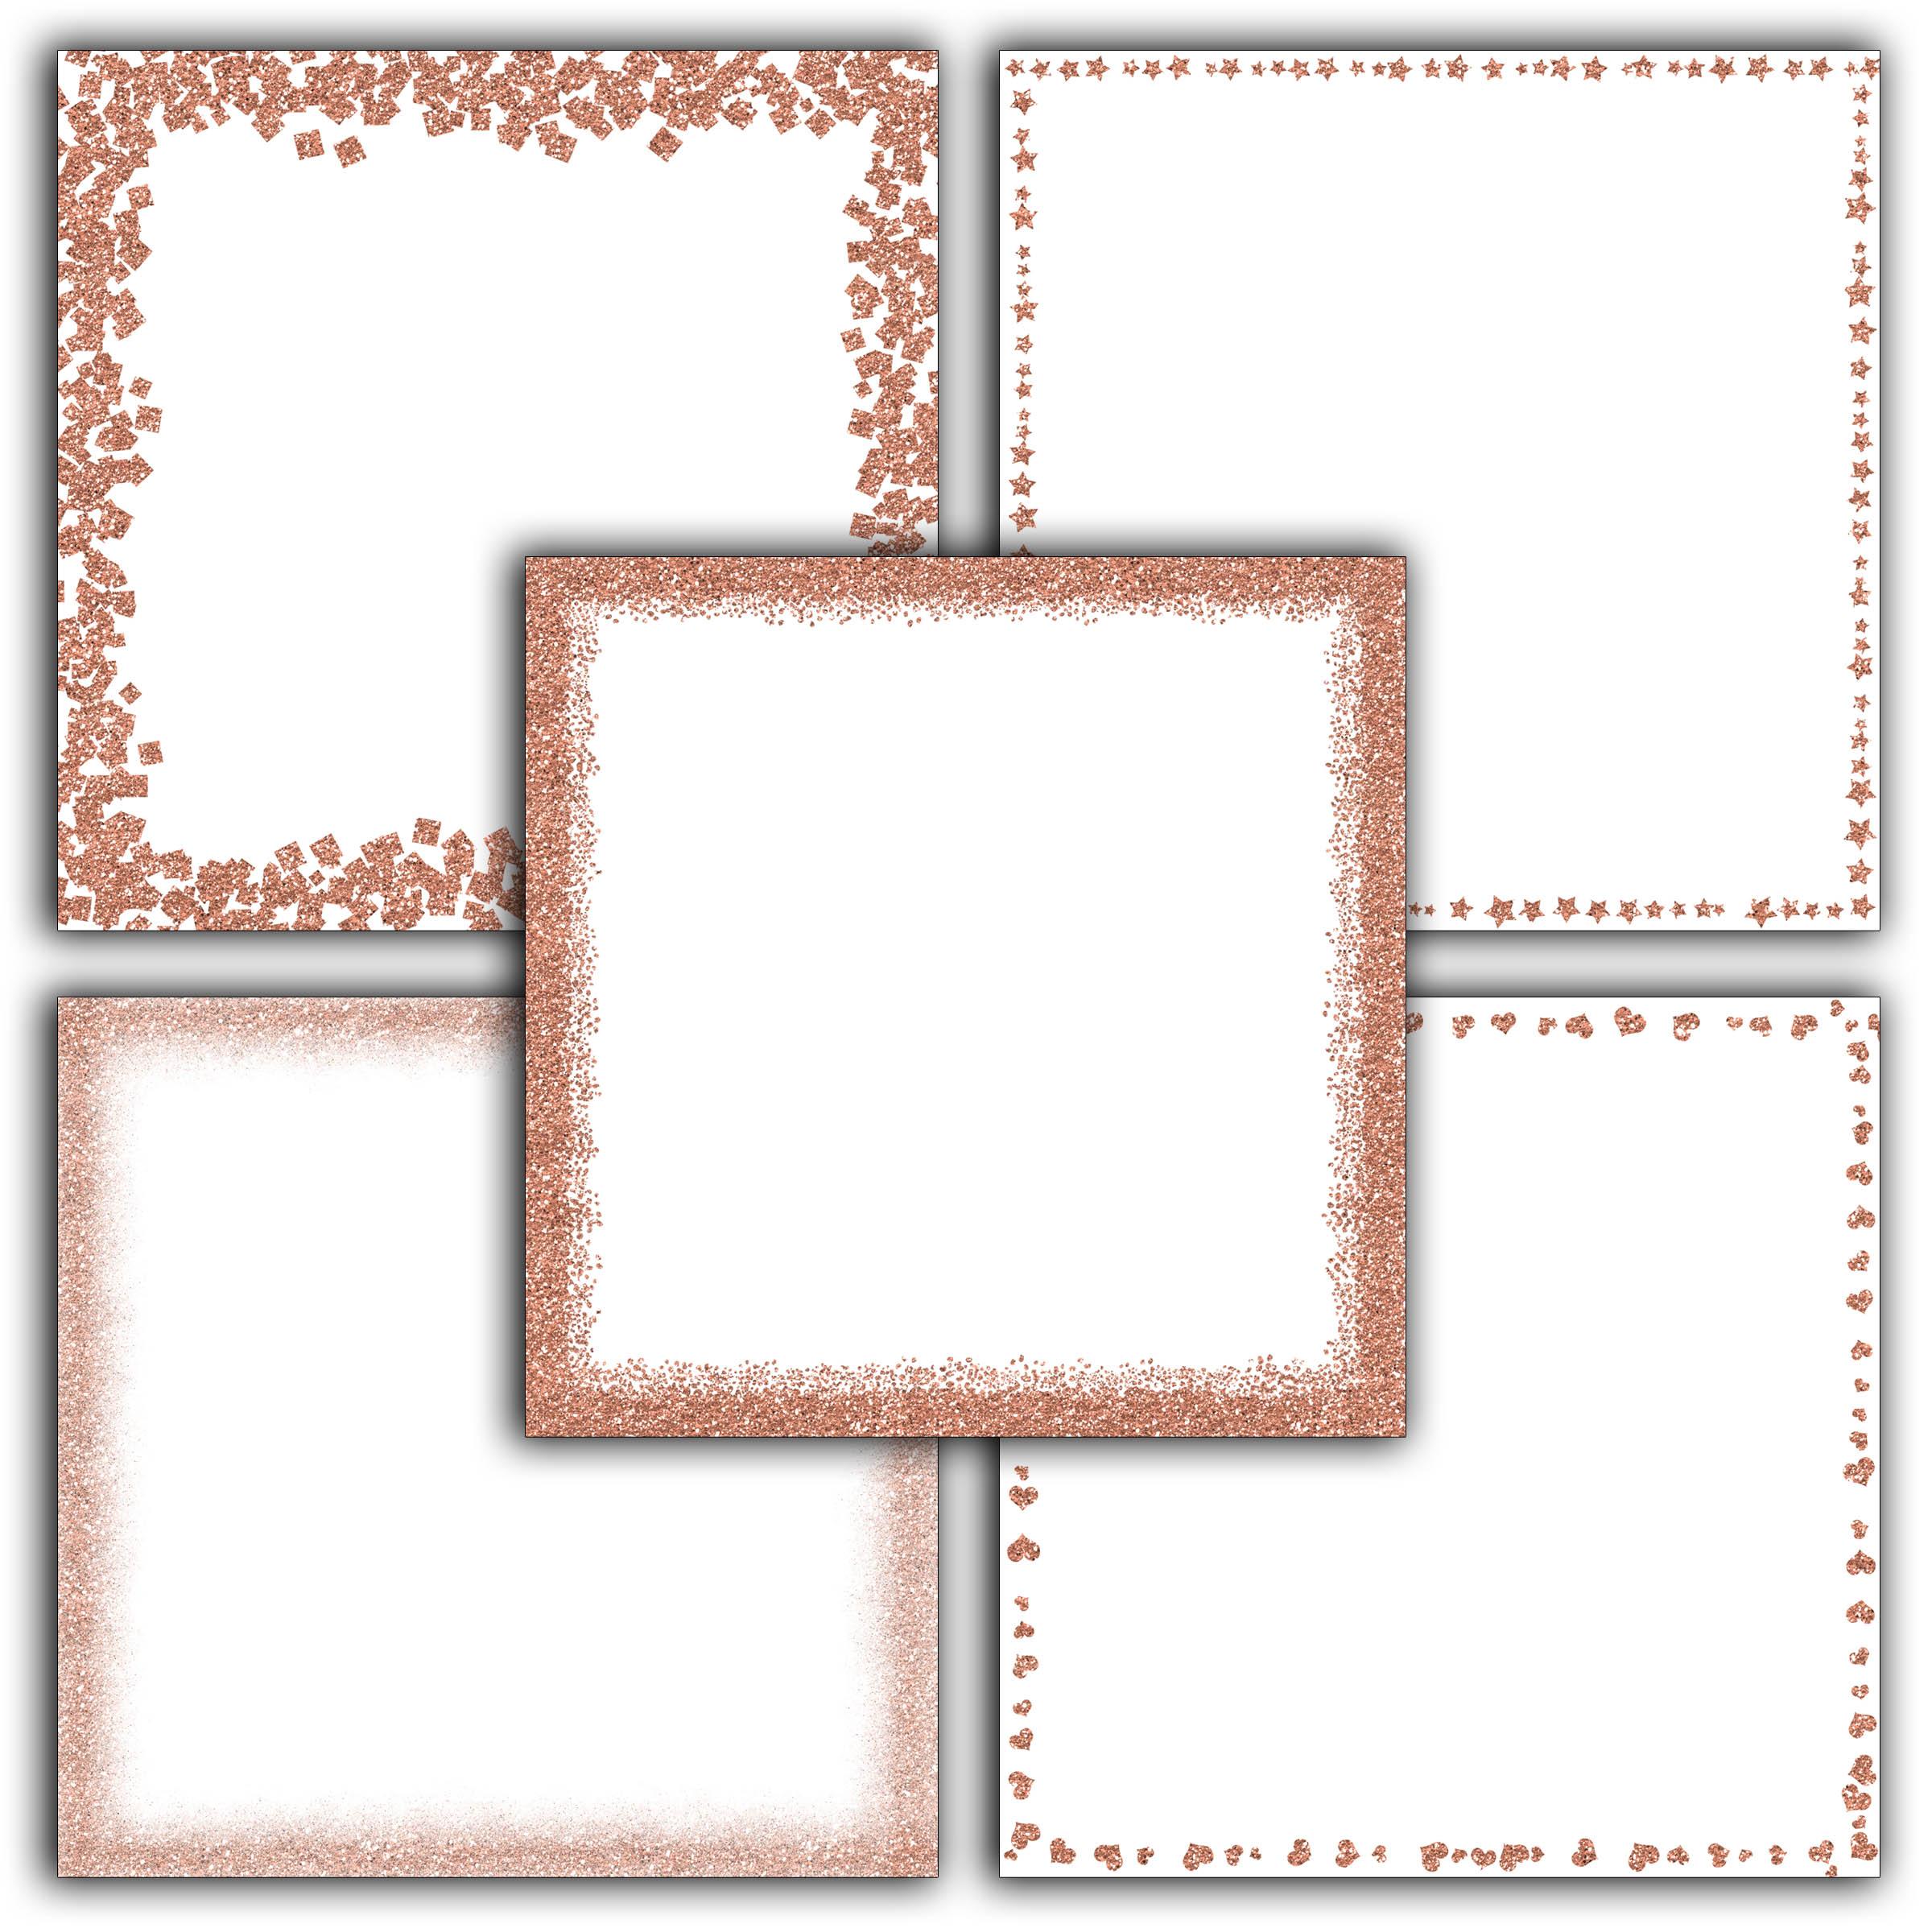 Rose Gold Glitter Borders Digital Paper example image 4